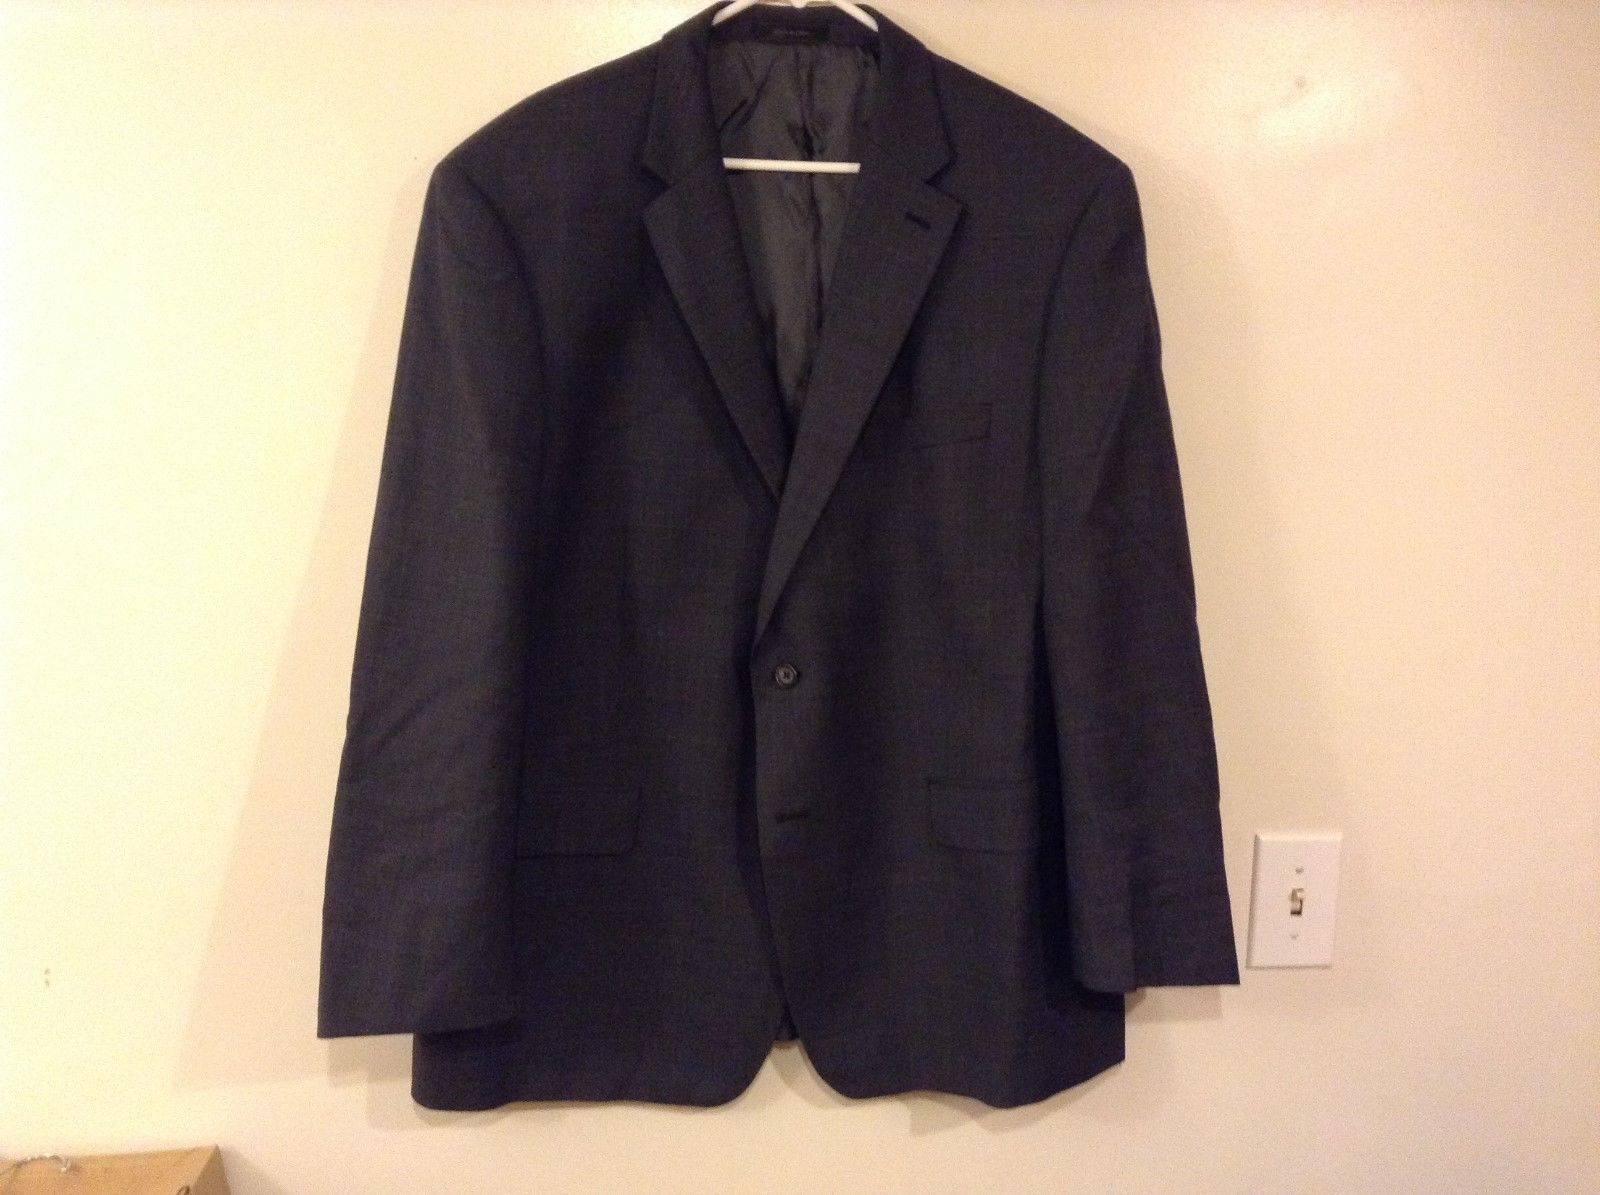 Ralph Lauren Wool Sports Jacket Sz 50R